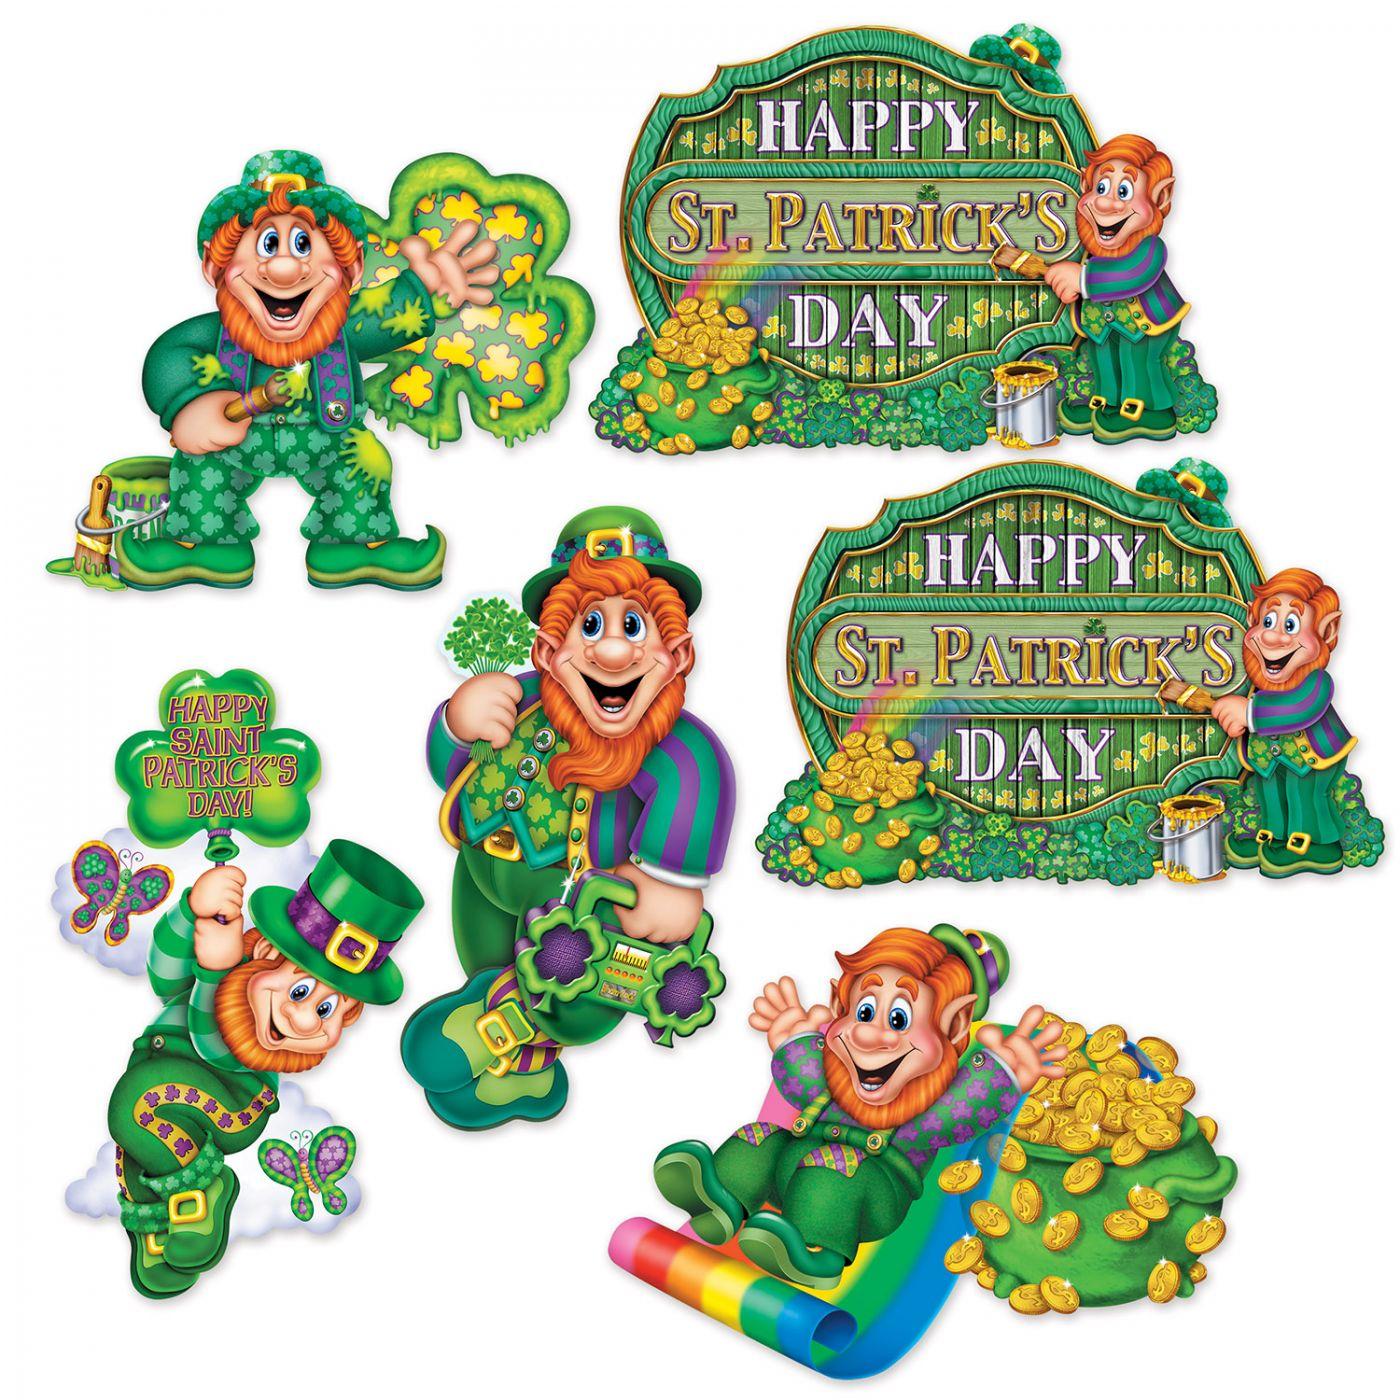 St Patrick's Day Cutouts image